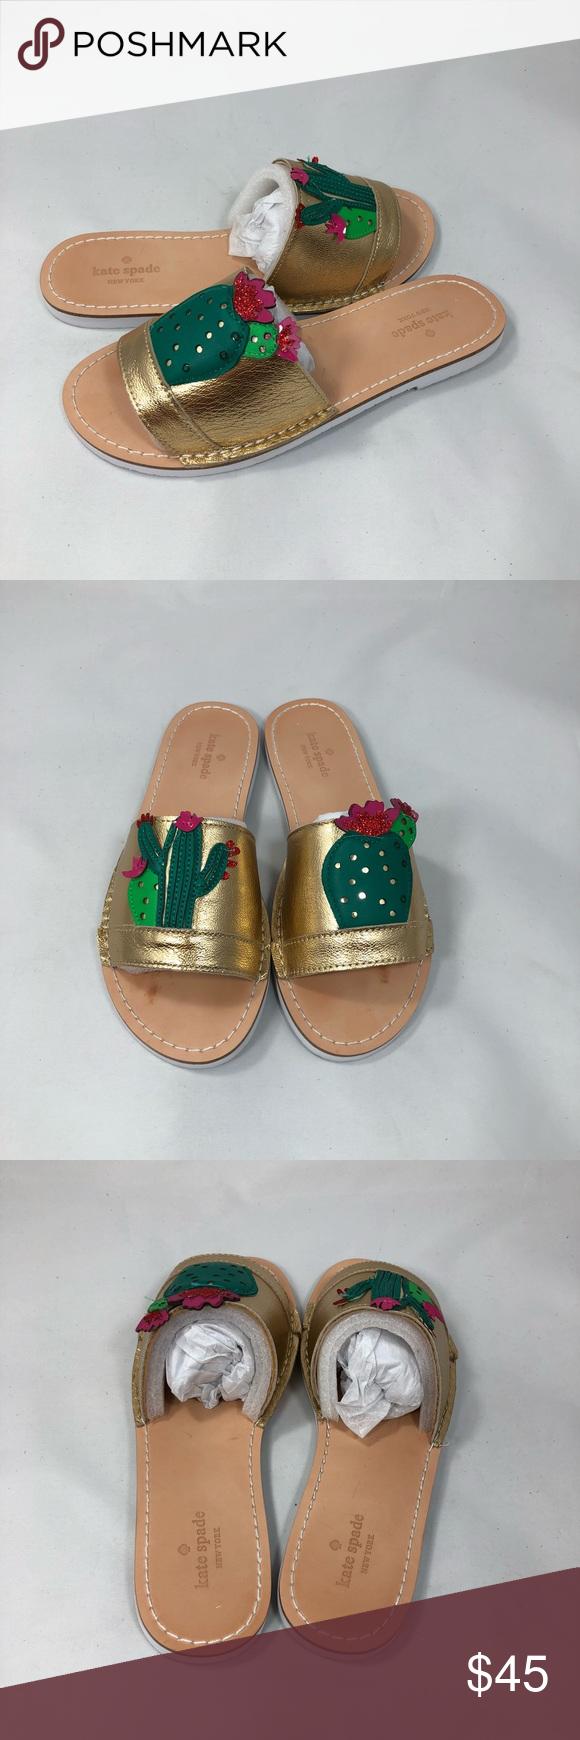 2d632ed3258d Kate spade iguana cactus slides 7.5